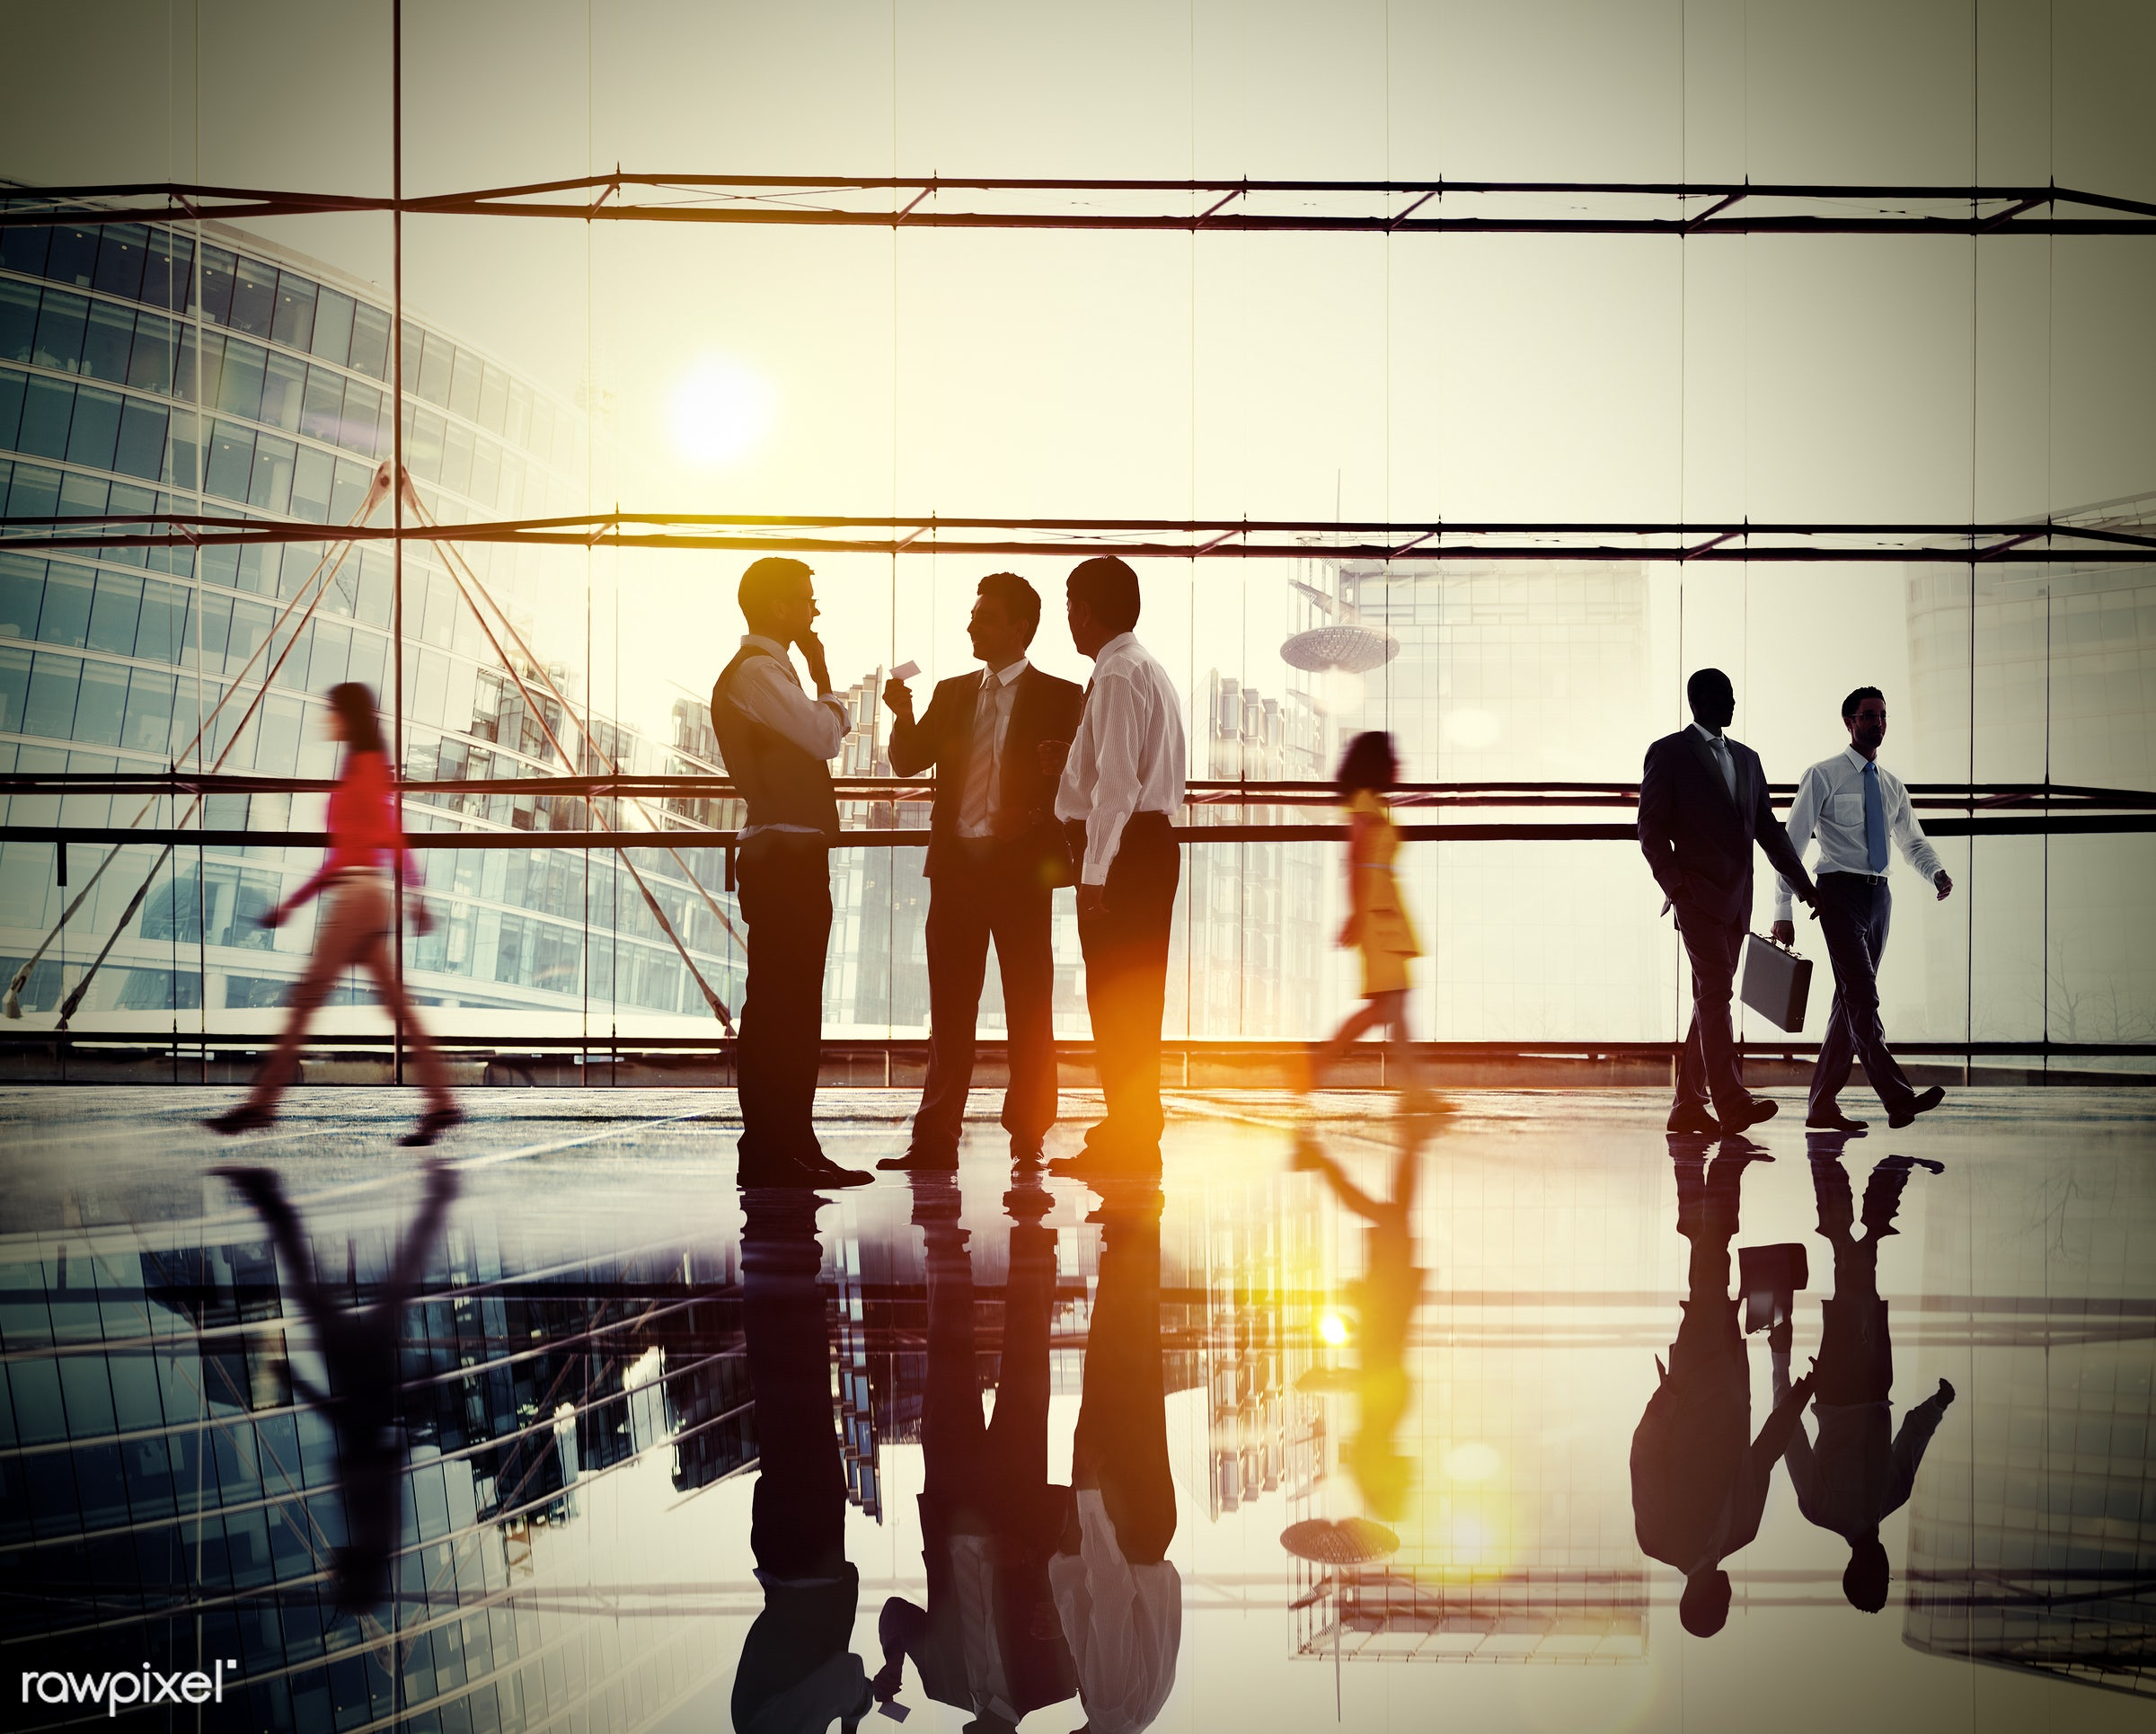 Dusk, brainstorming, building, business, business people, businessmen, businesswomen, busy, city, cityscape, colleague,...